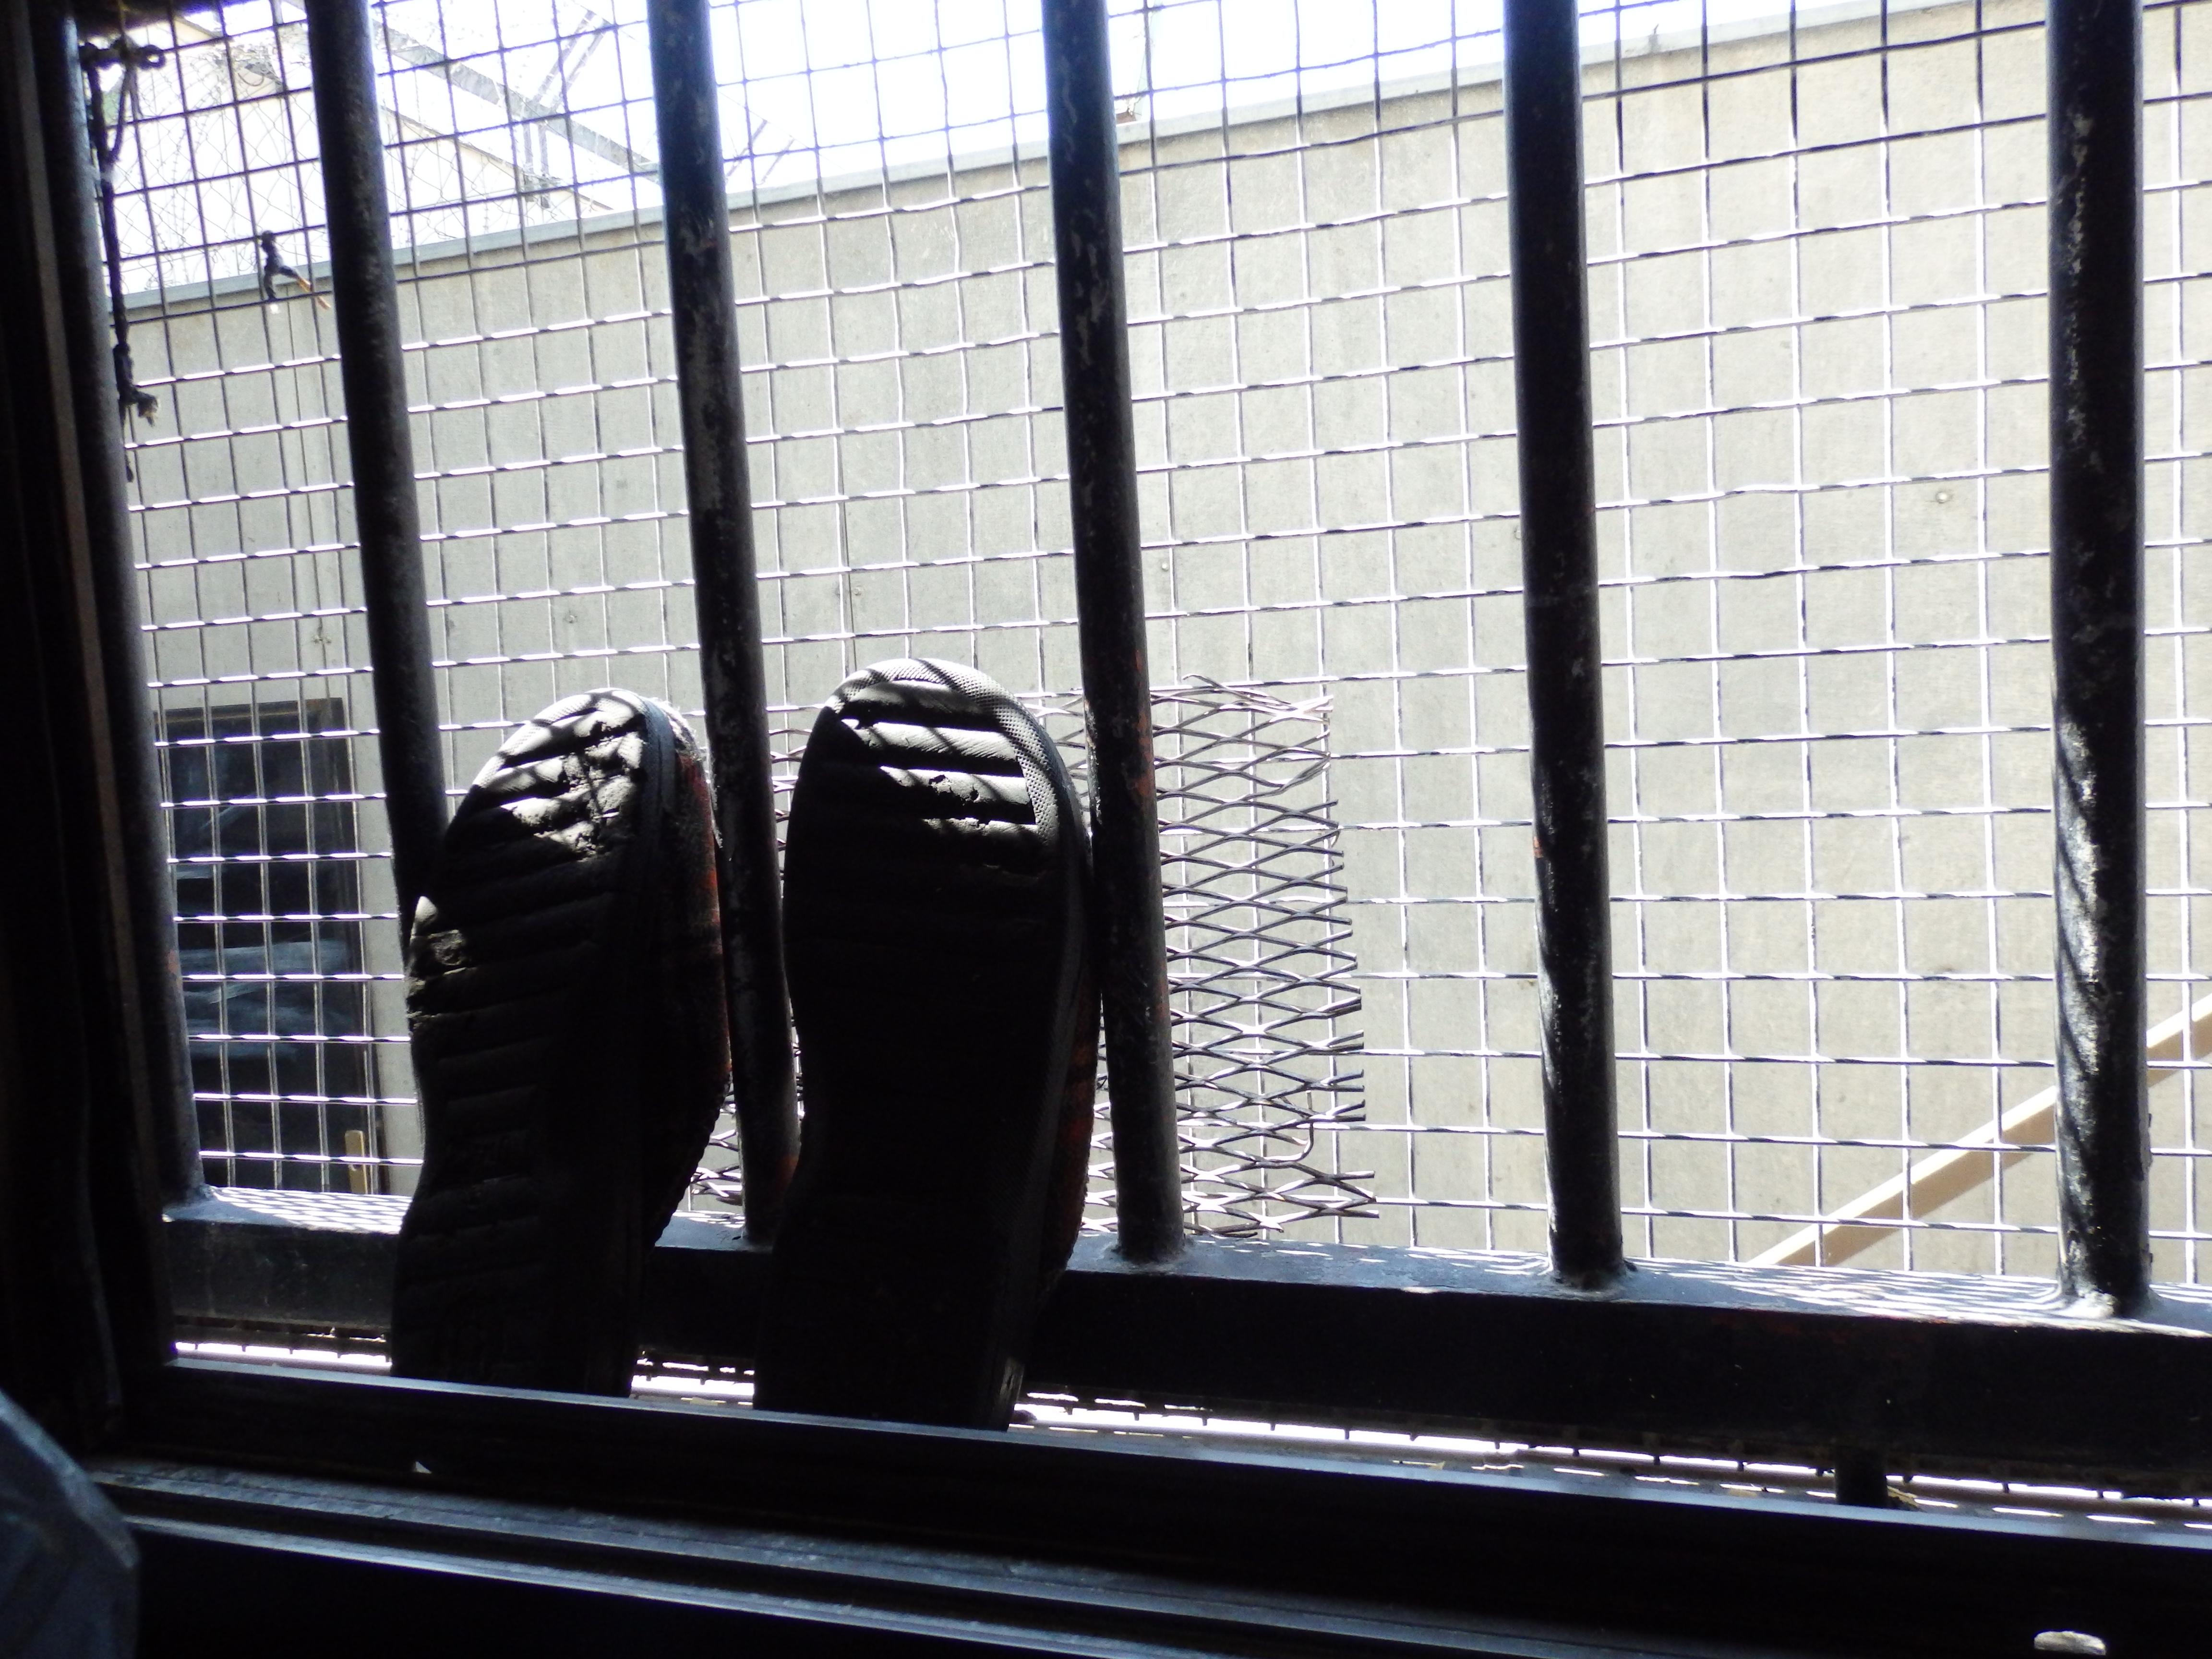 Posjet Zatvor Split lipanj 2015 3